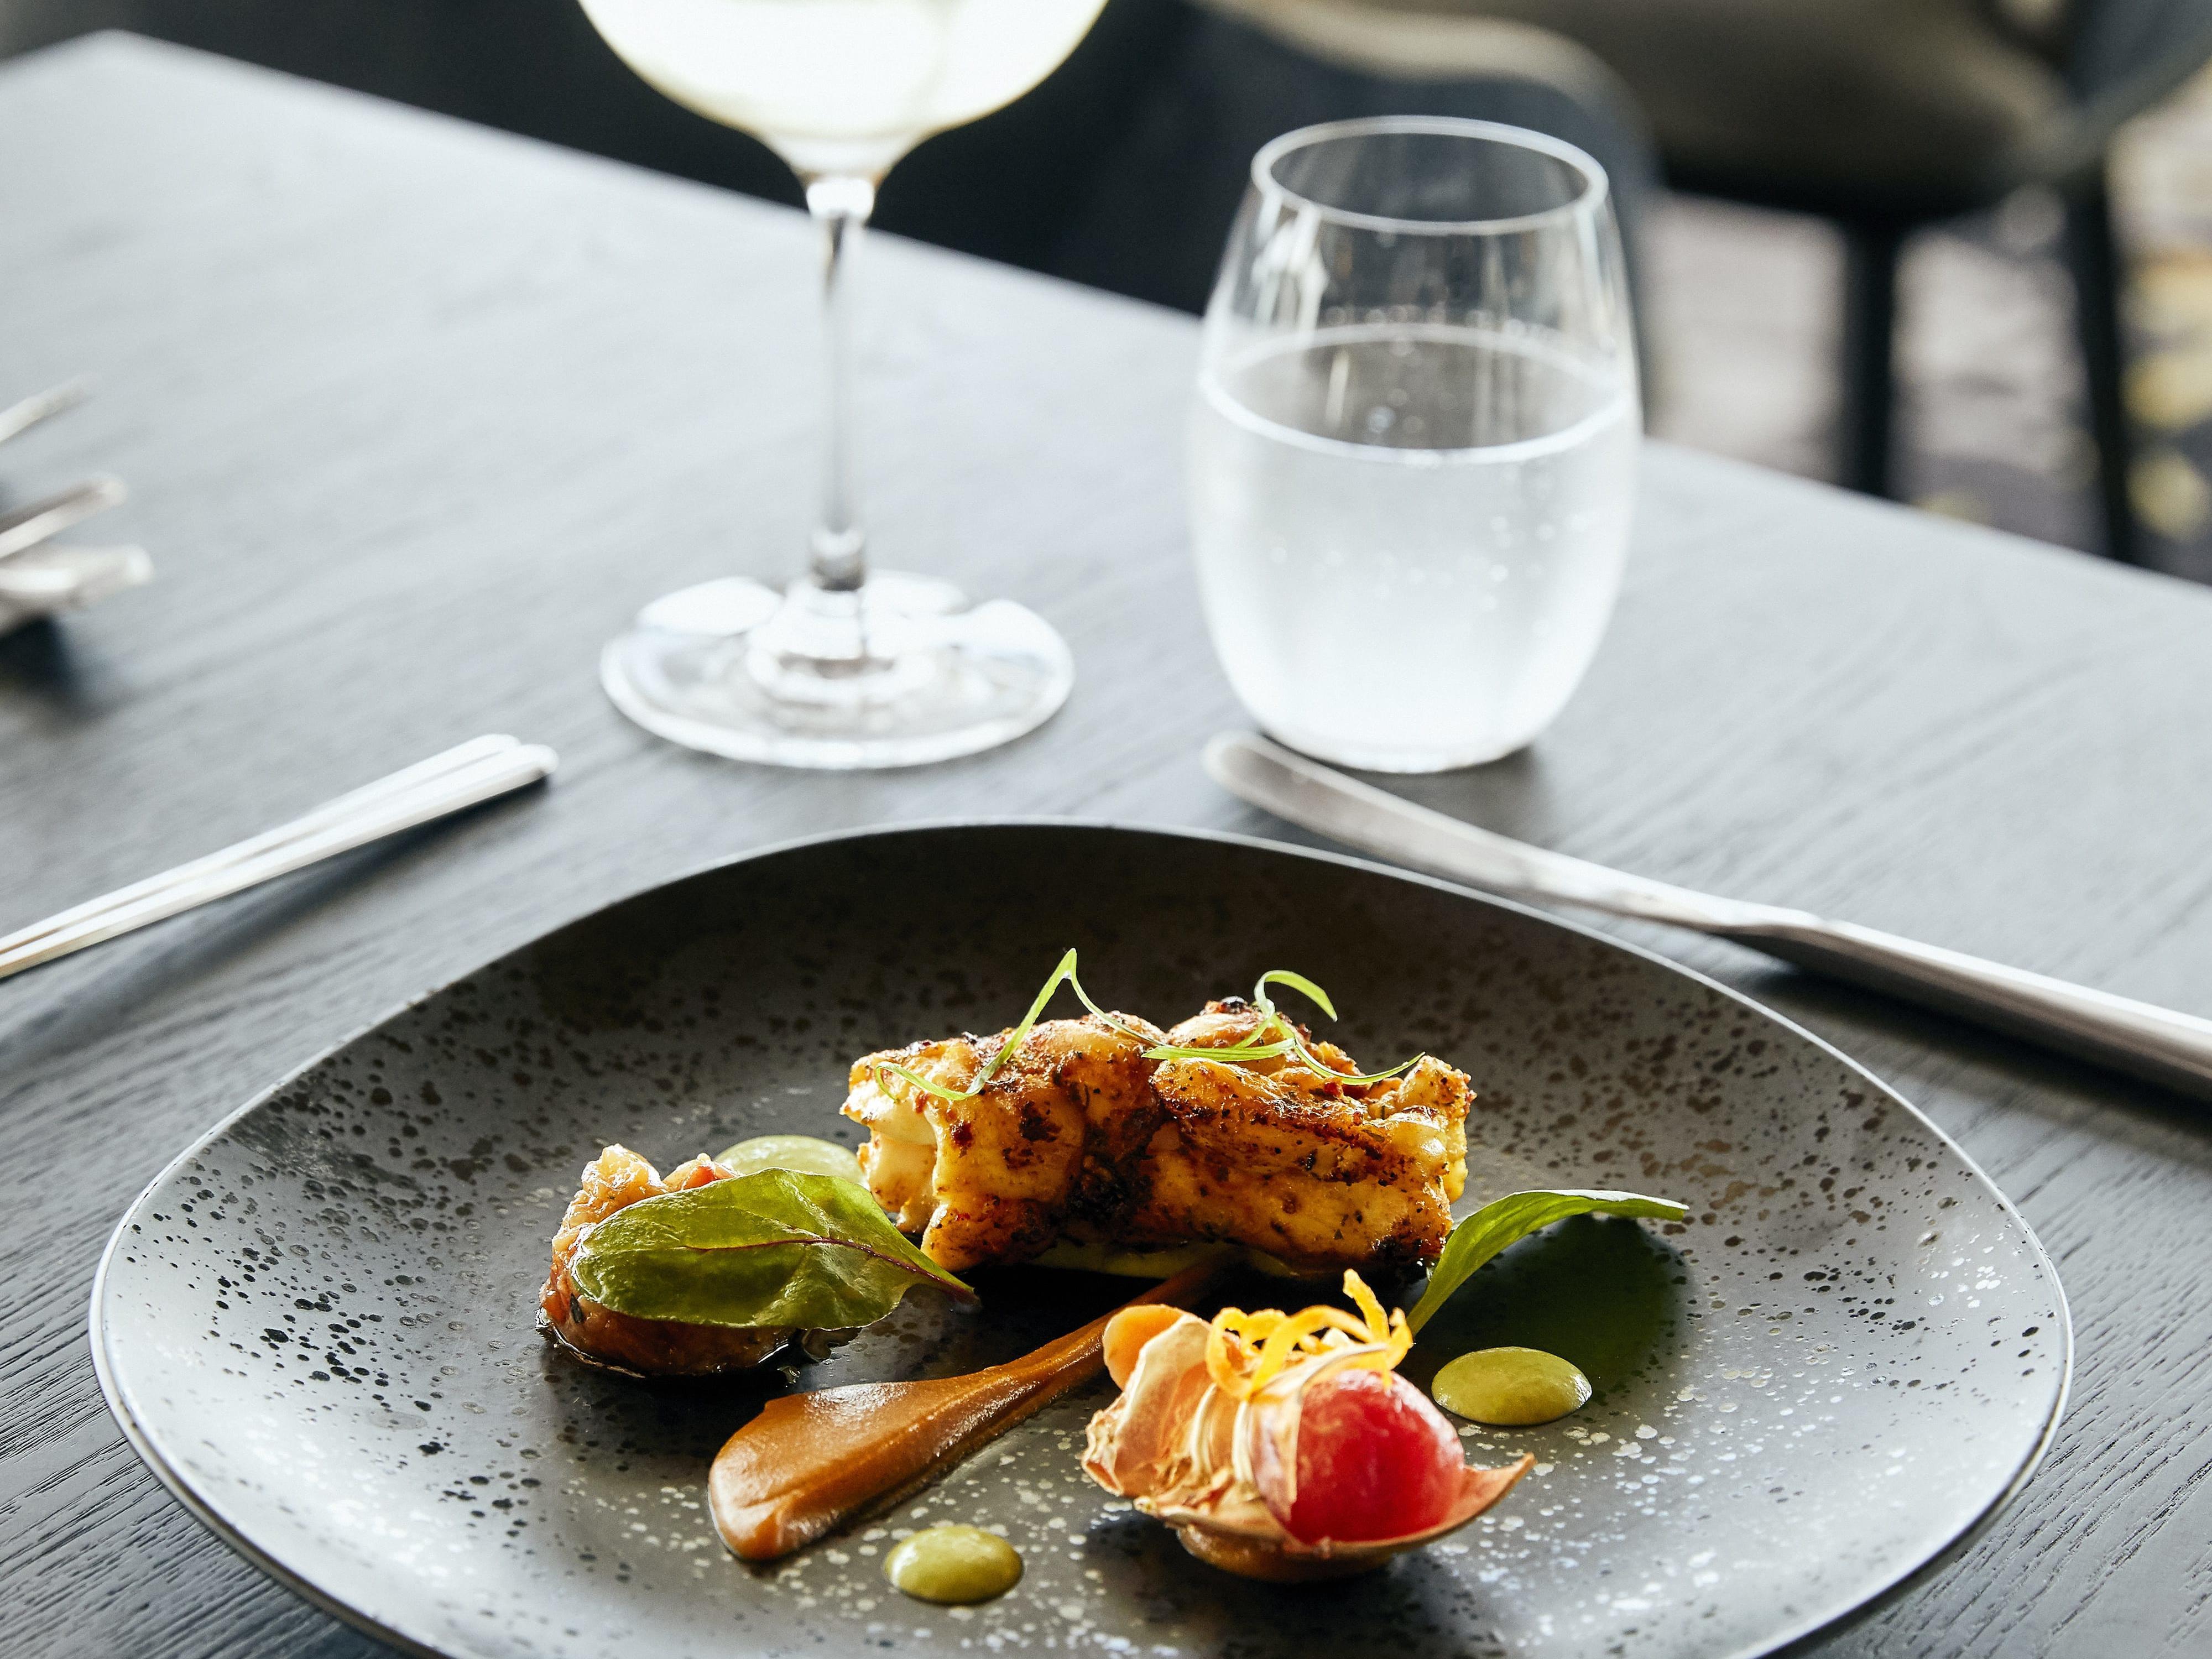 Infinity Restaurant Menu - Lobster